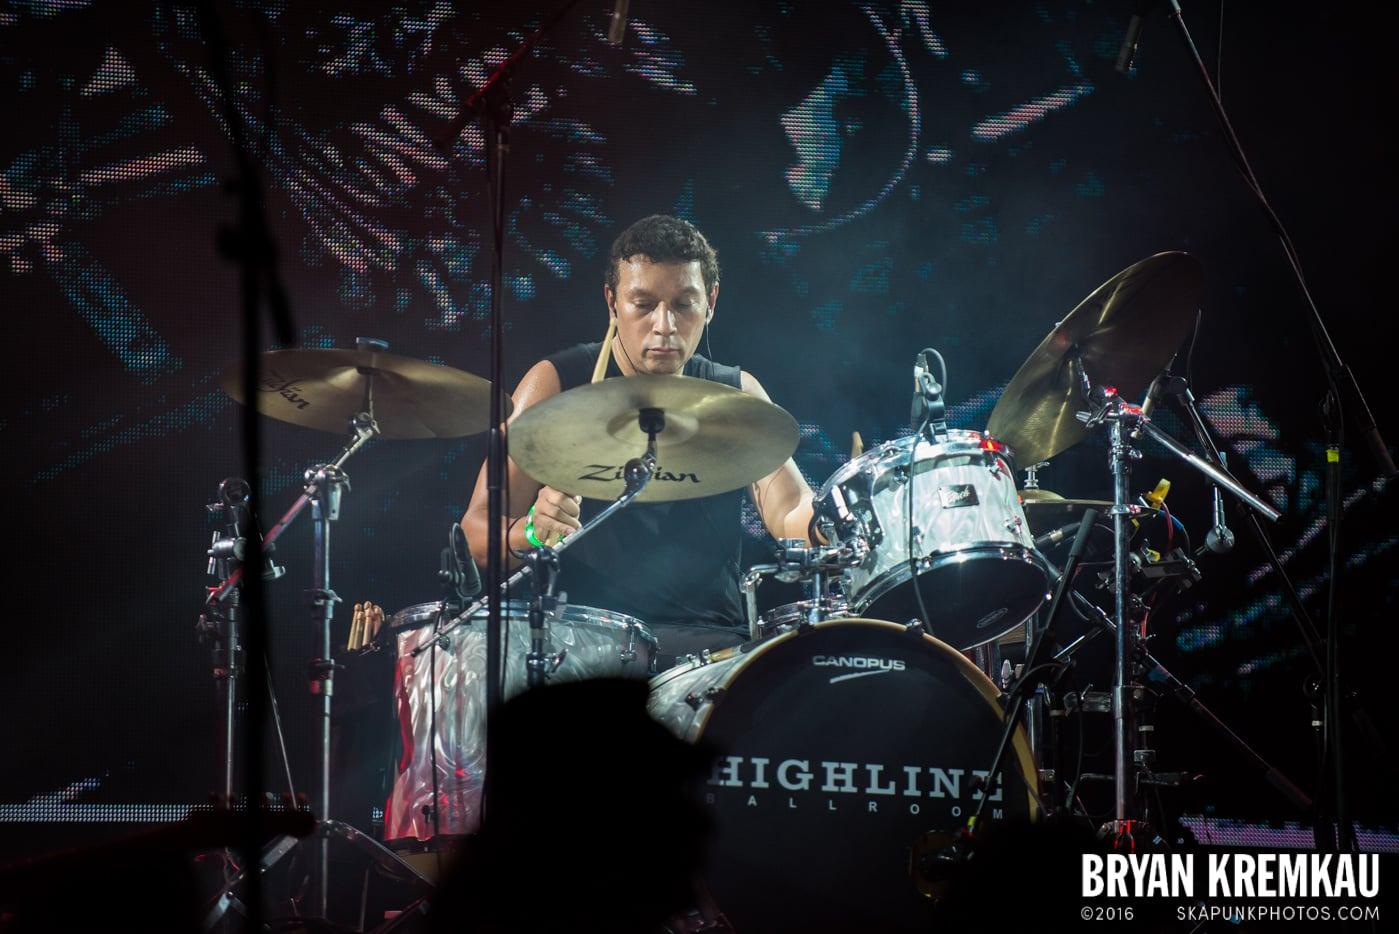 Willie Nile @ Highline Ballroom, NYC - 12.26.14 (14)